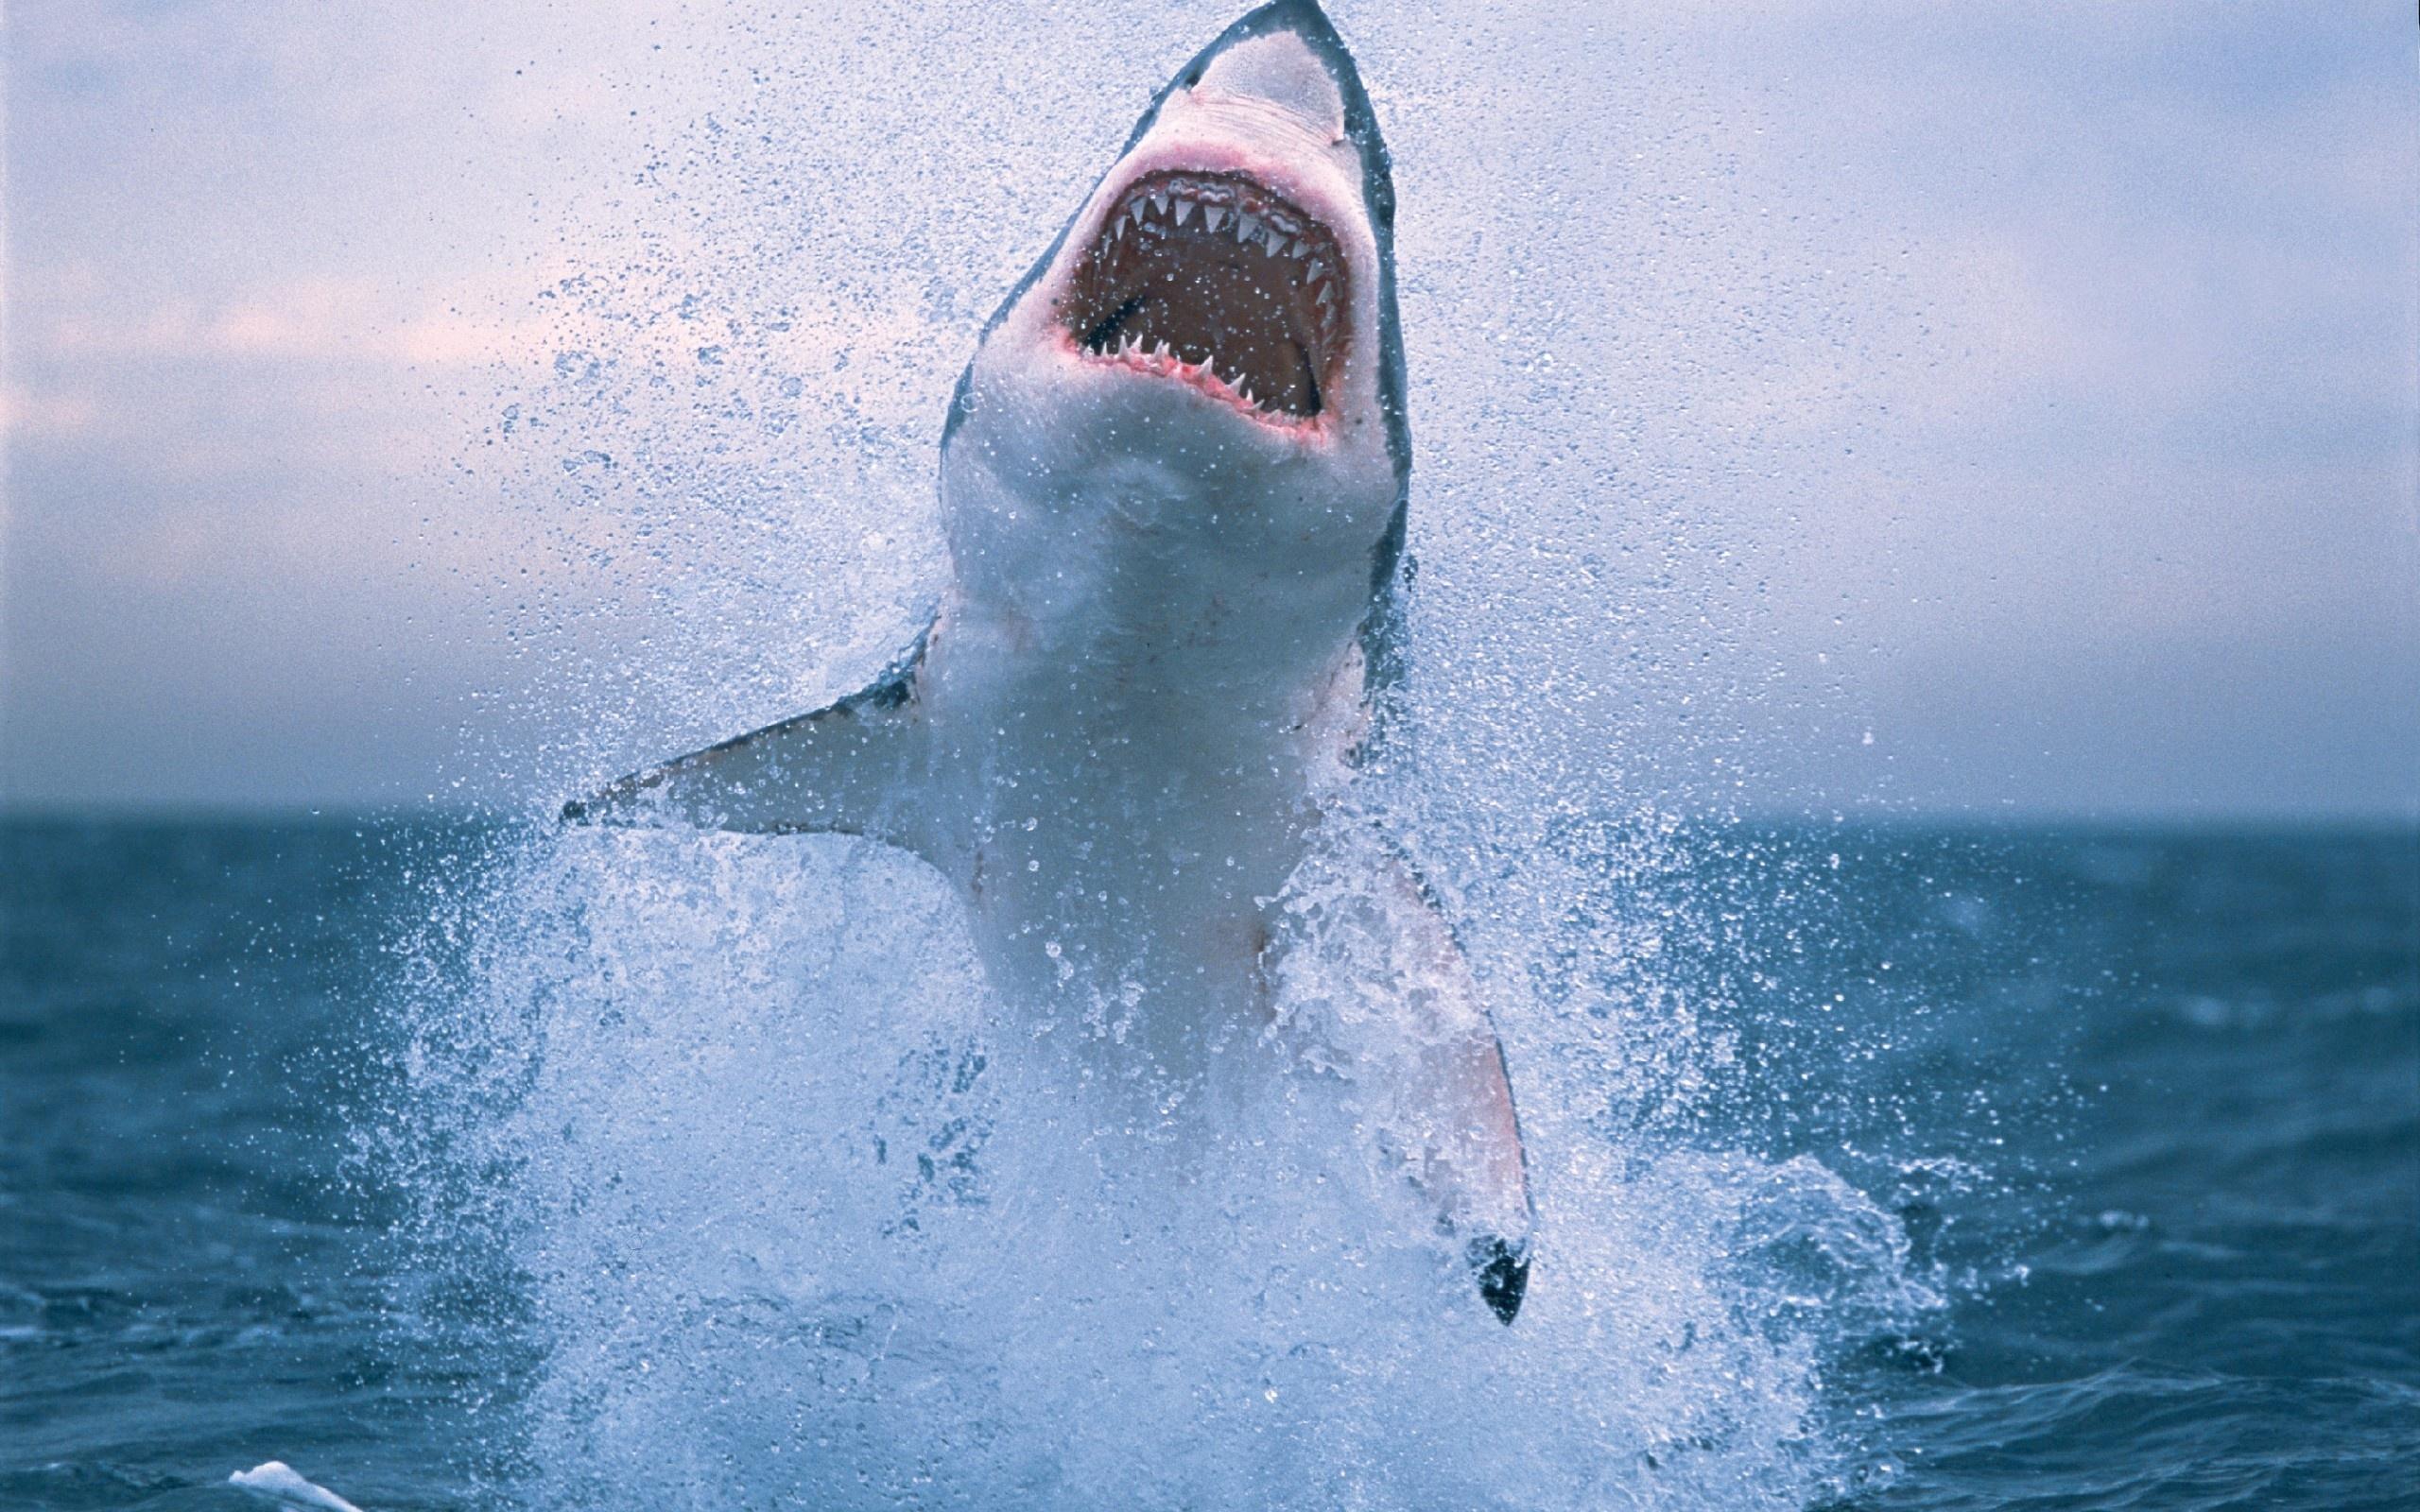 download wallpaper shark 1600 - photo #18